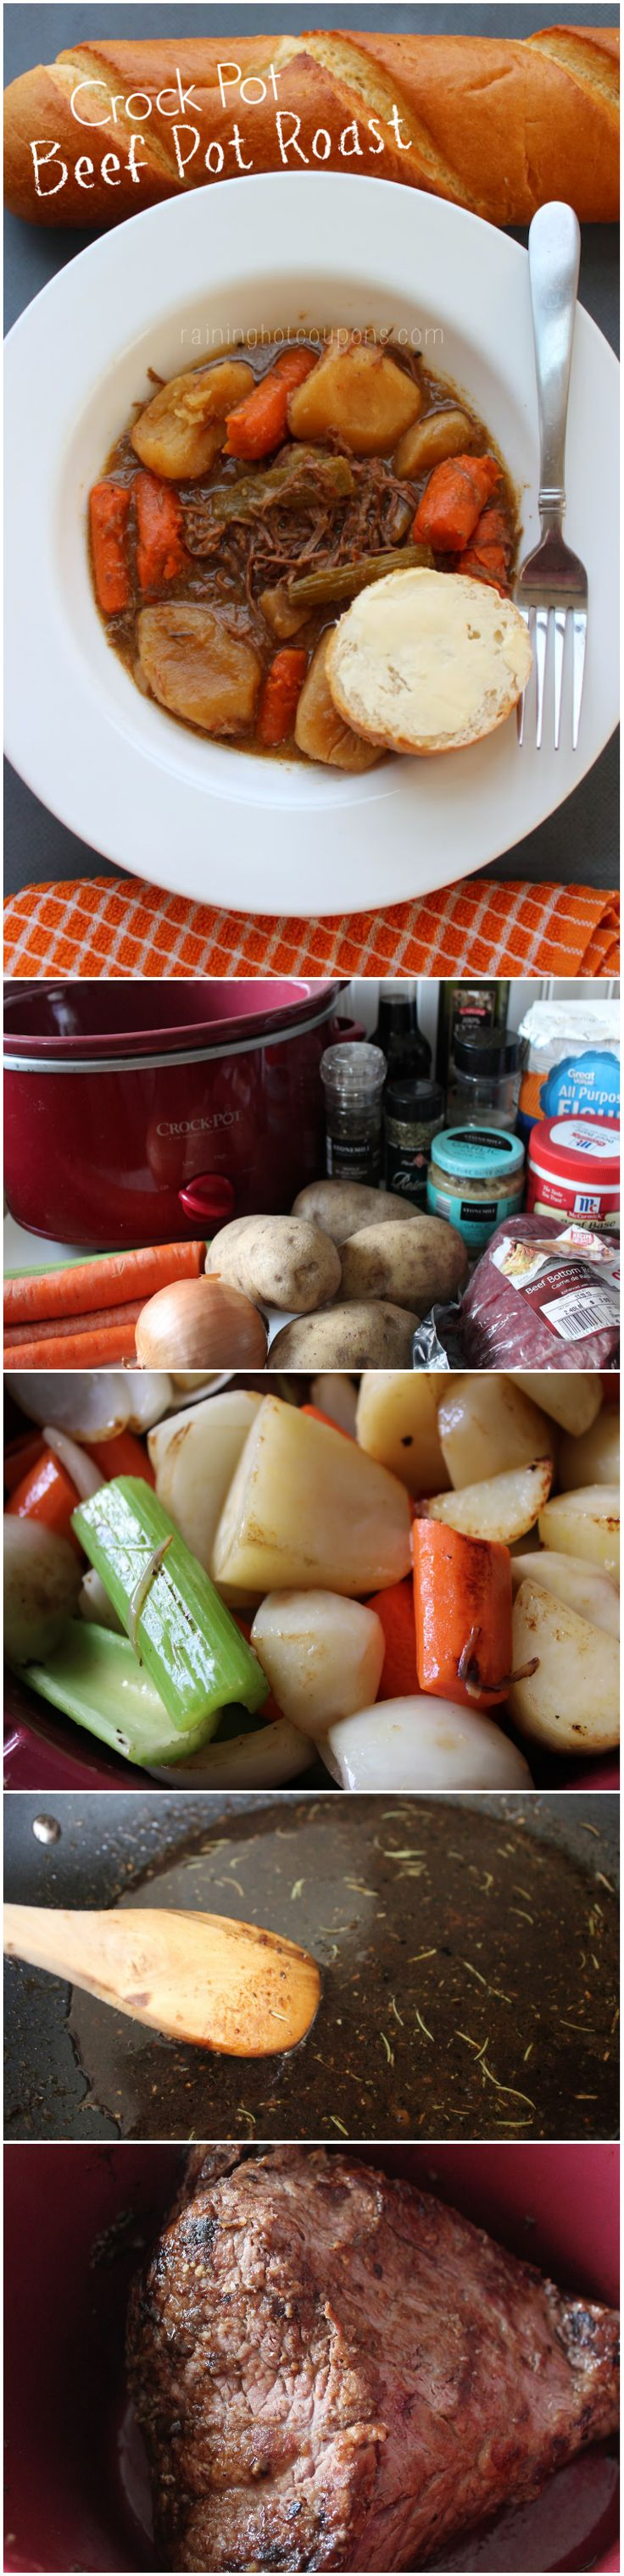 Crock Pot Beef Pot Roast - #slowcookerrecipes #crockpotrecipes #comfortfood #crockpotcooking